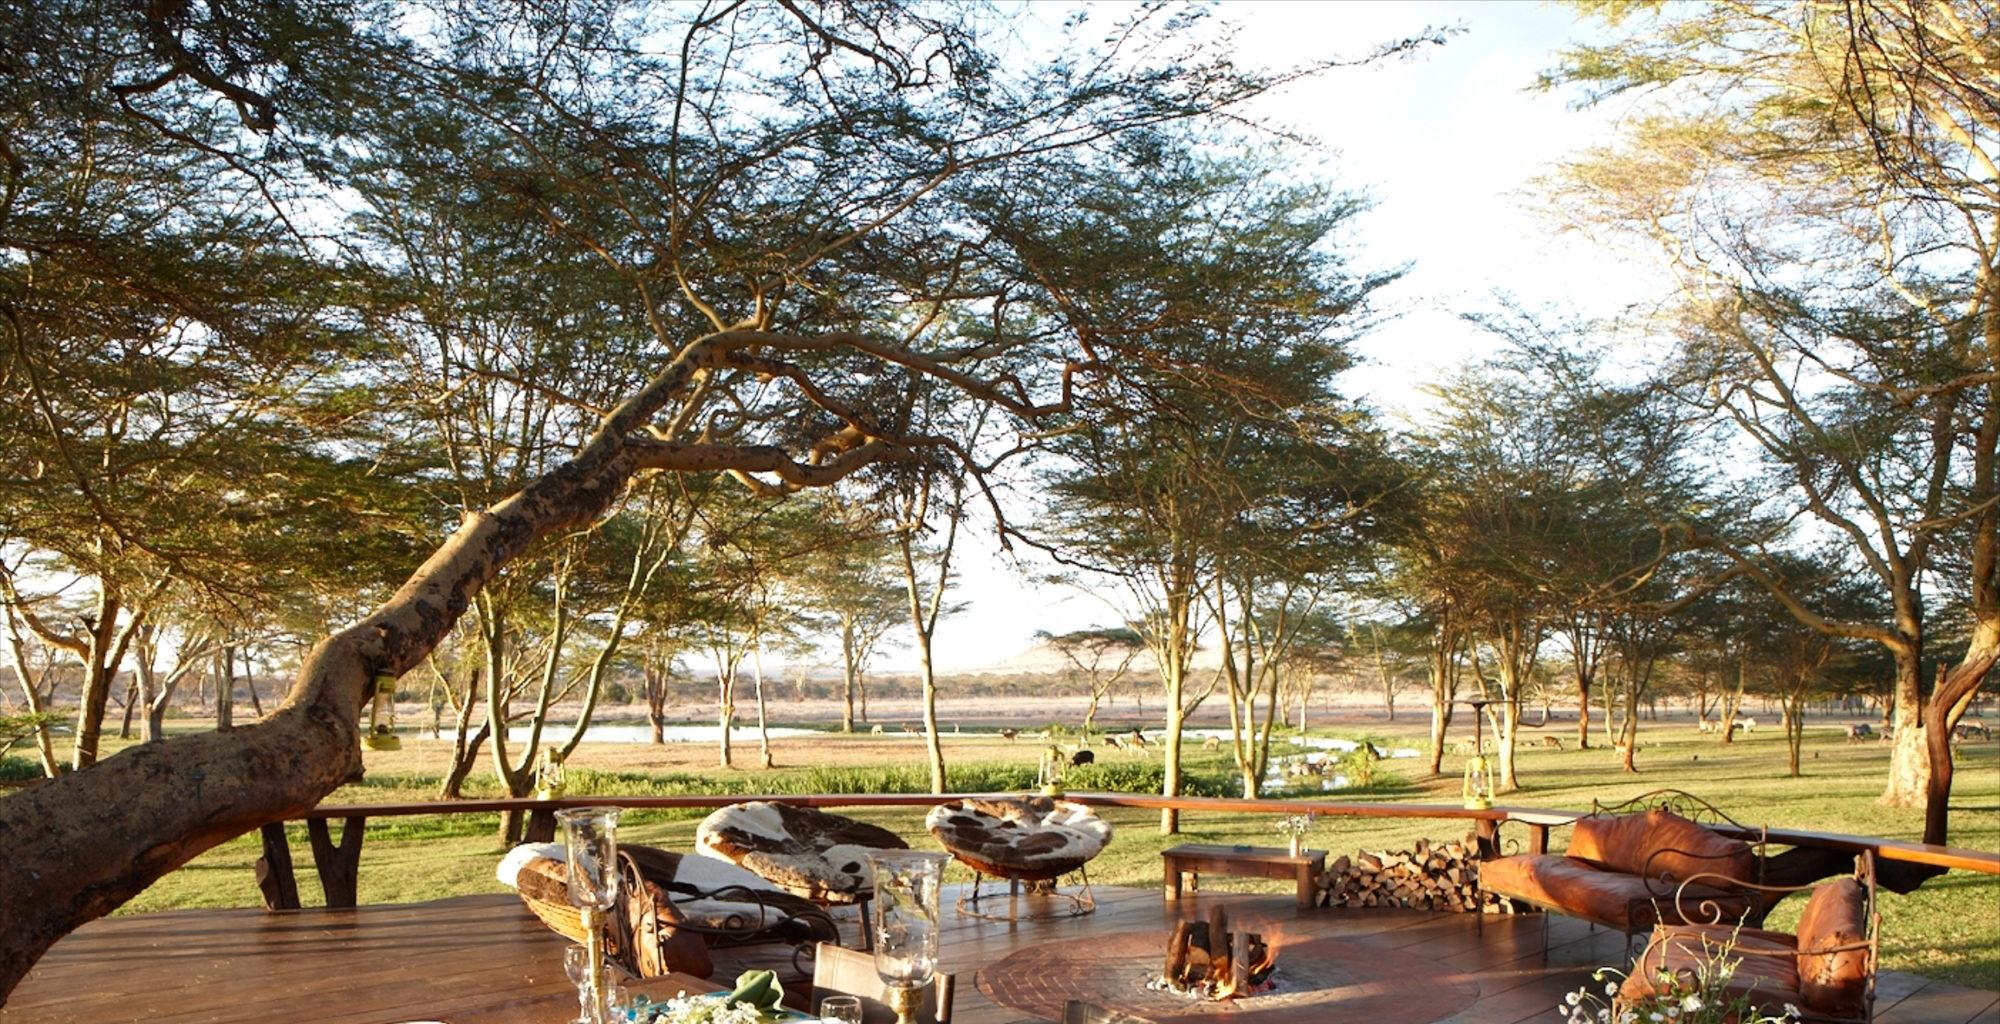 Sirikoi-Willys-Camp-Kenya-View